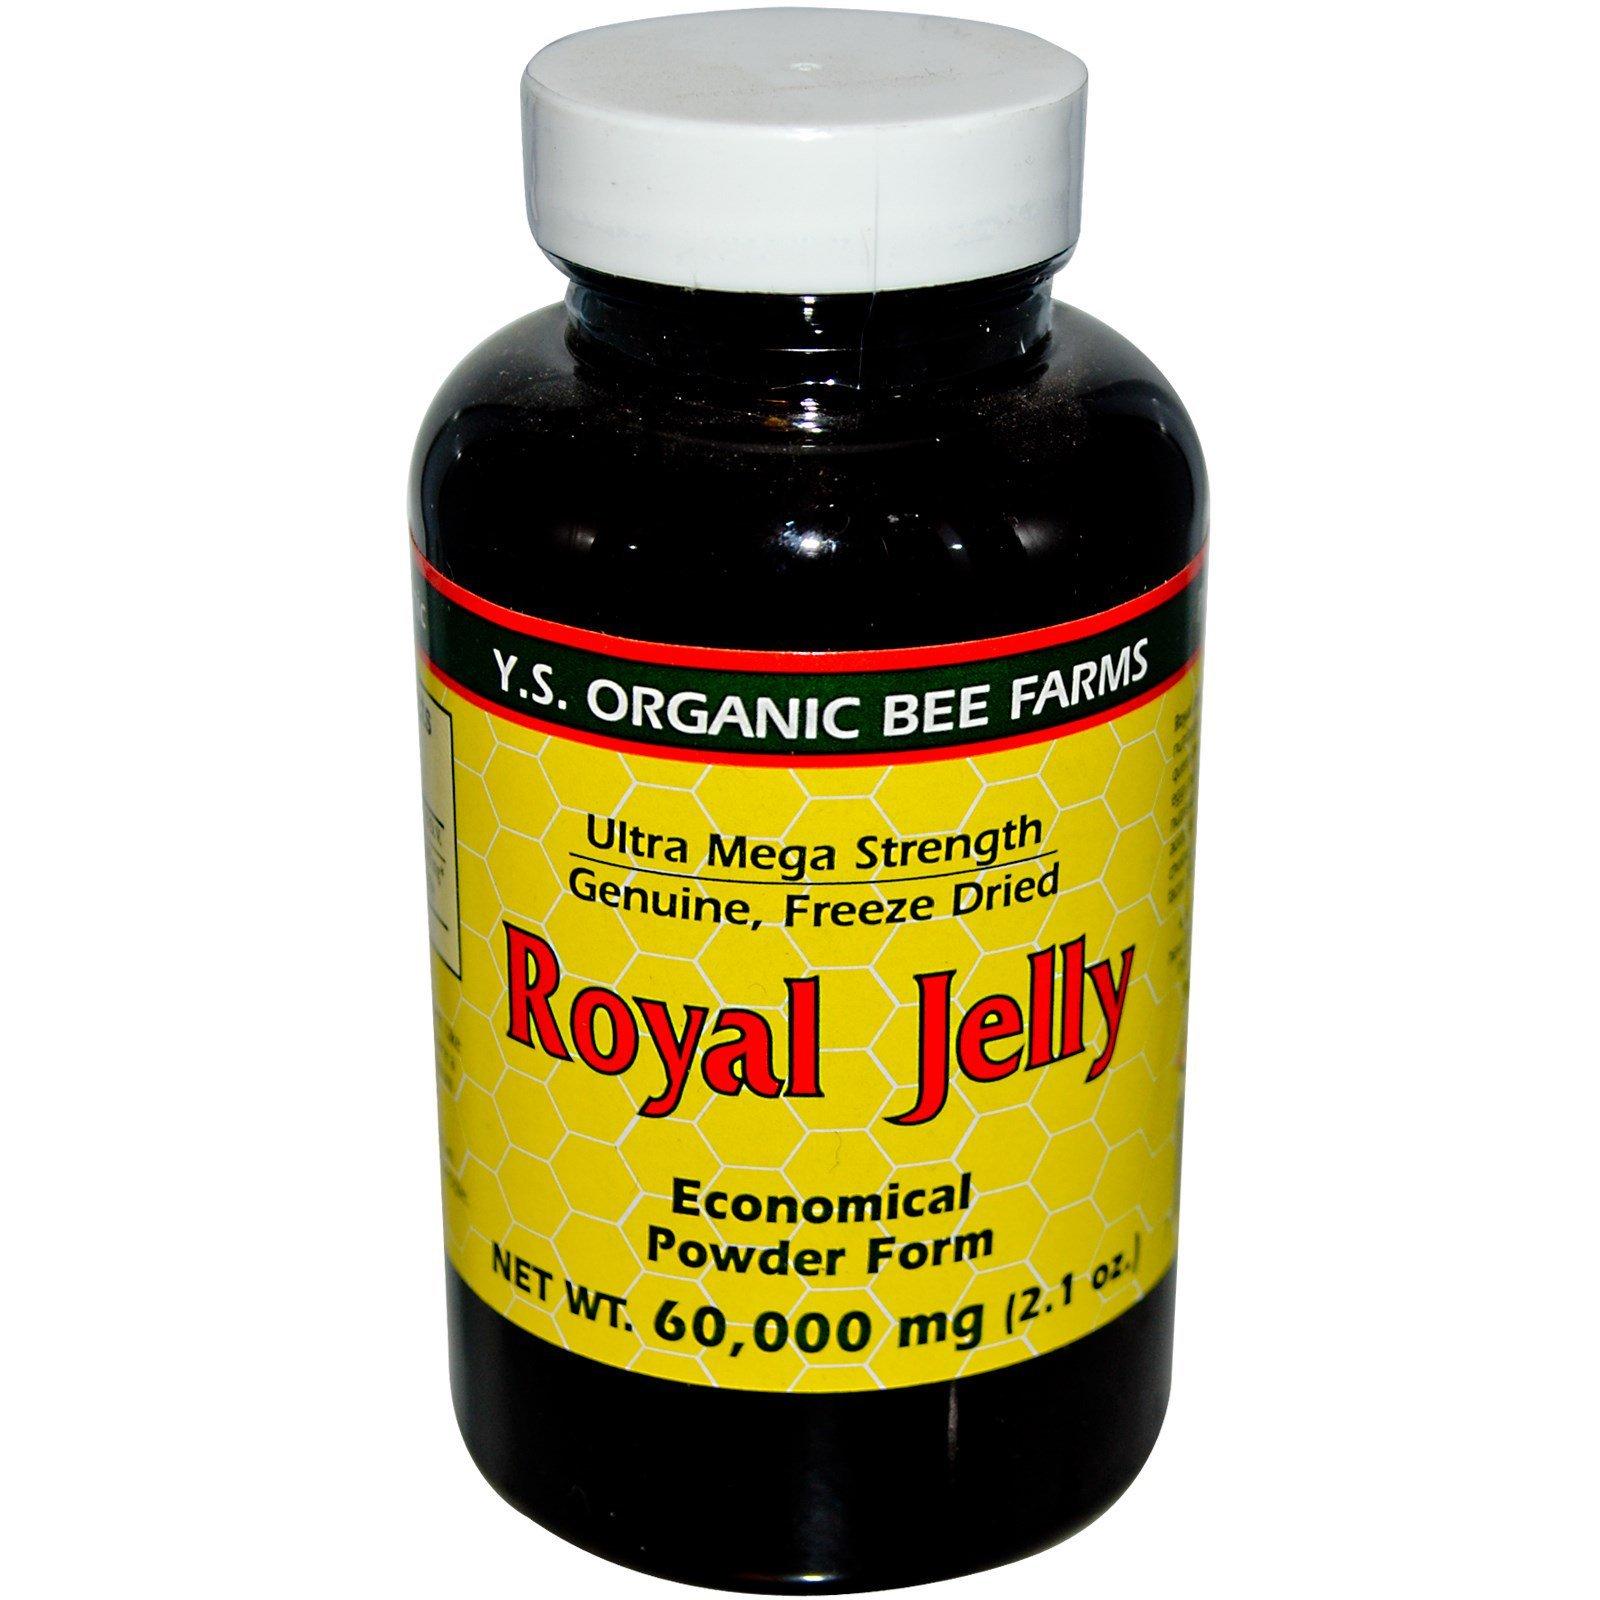 100% Pure Freeze Dried Fresh Royal Jelly - 60,000 mg YS Eco Bee Farms 2.1 oz Pow by YS Eco Bee Farms